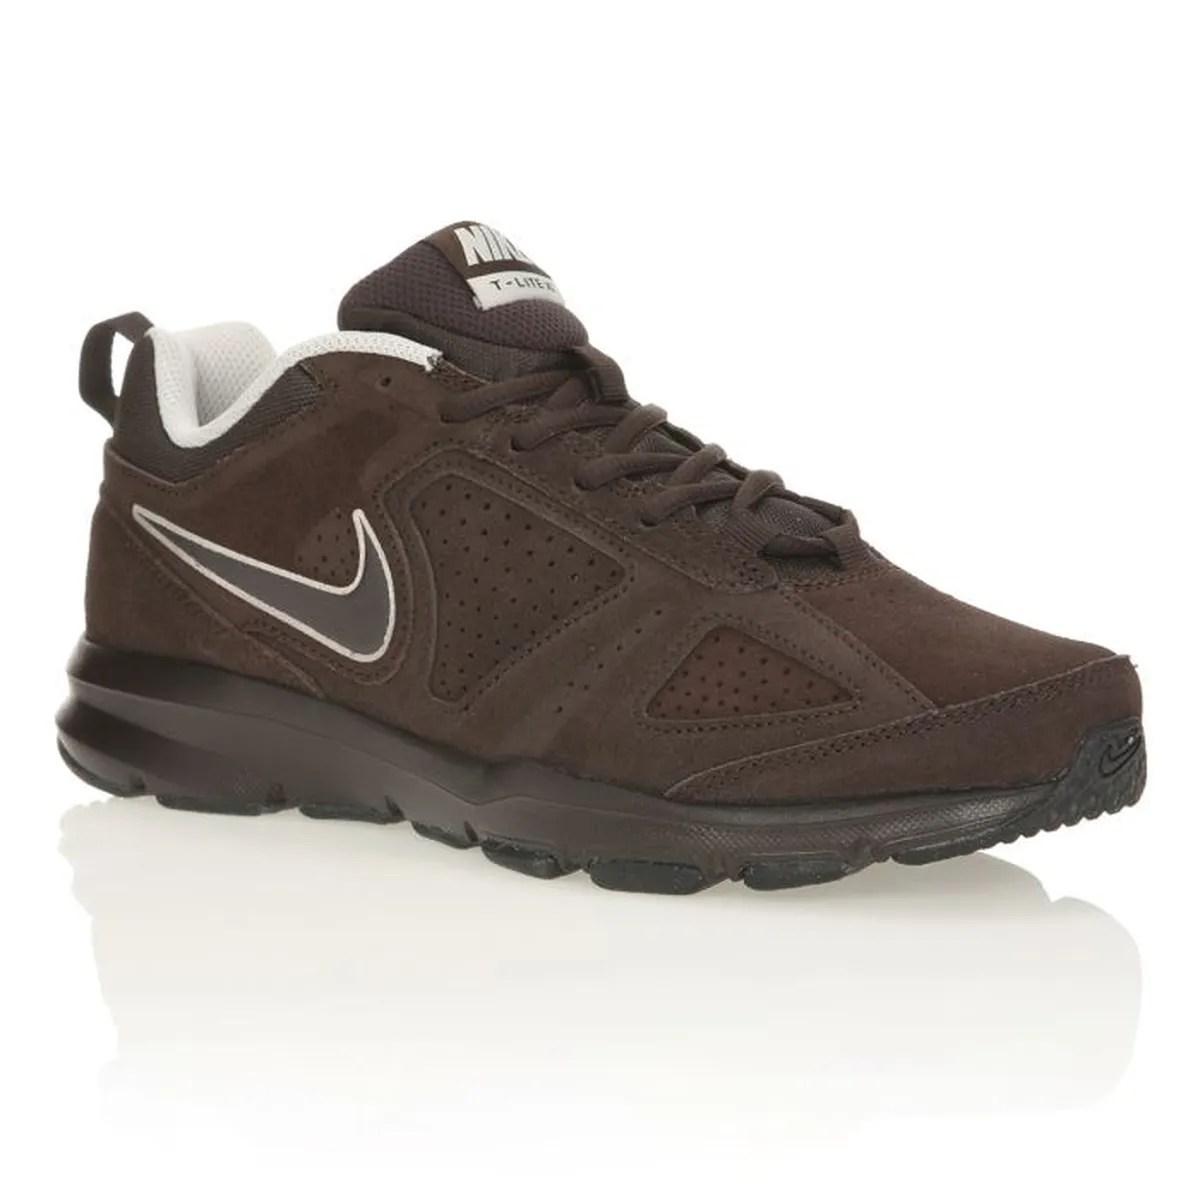 Chaussure sportswear homme